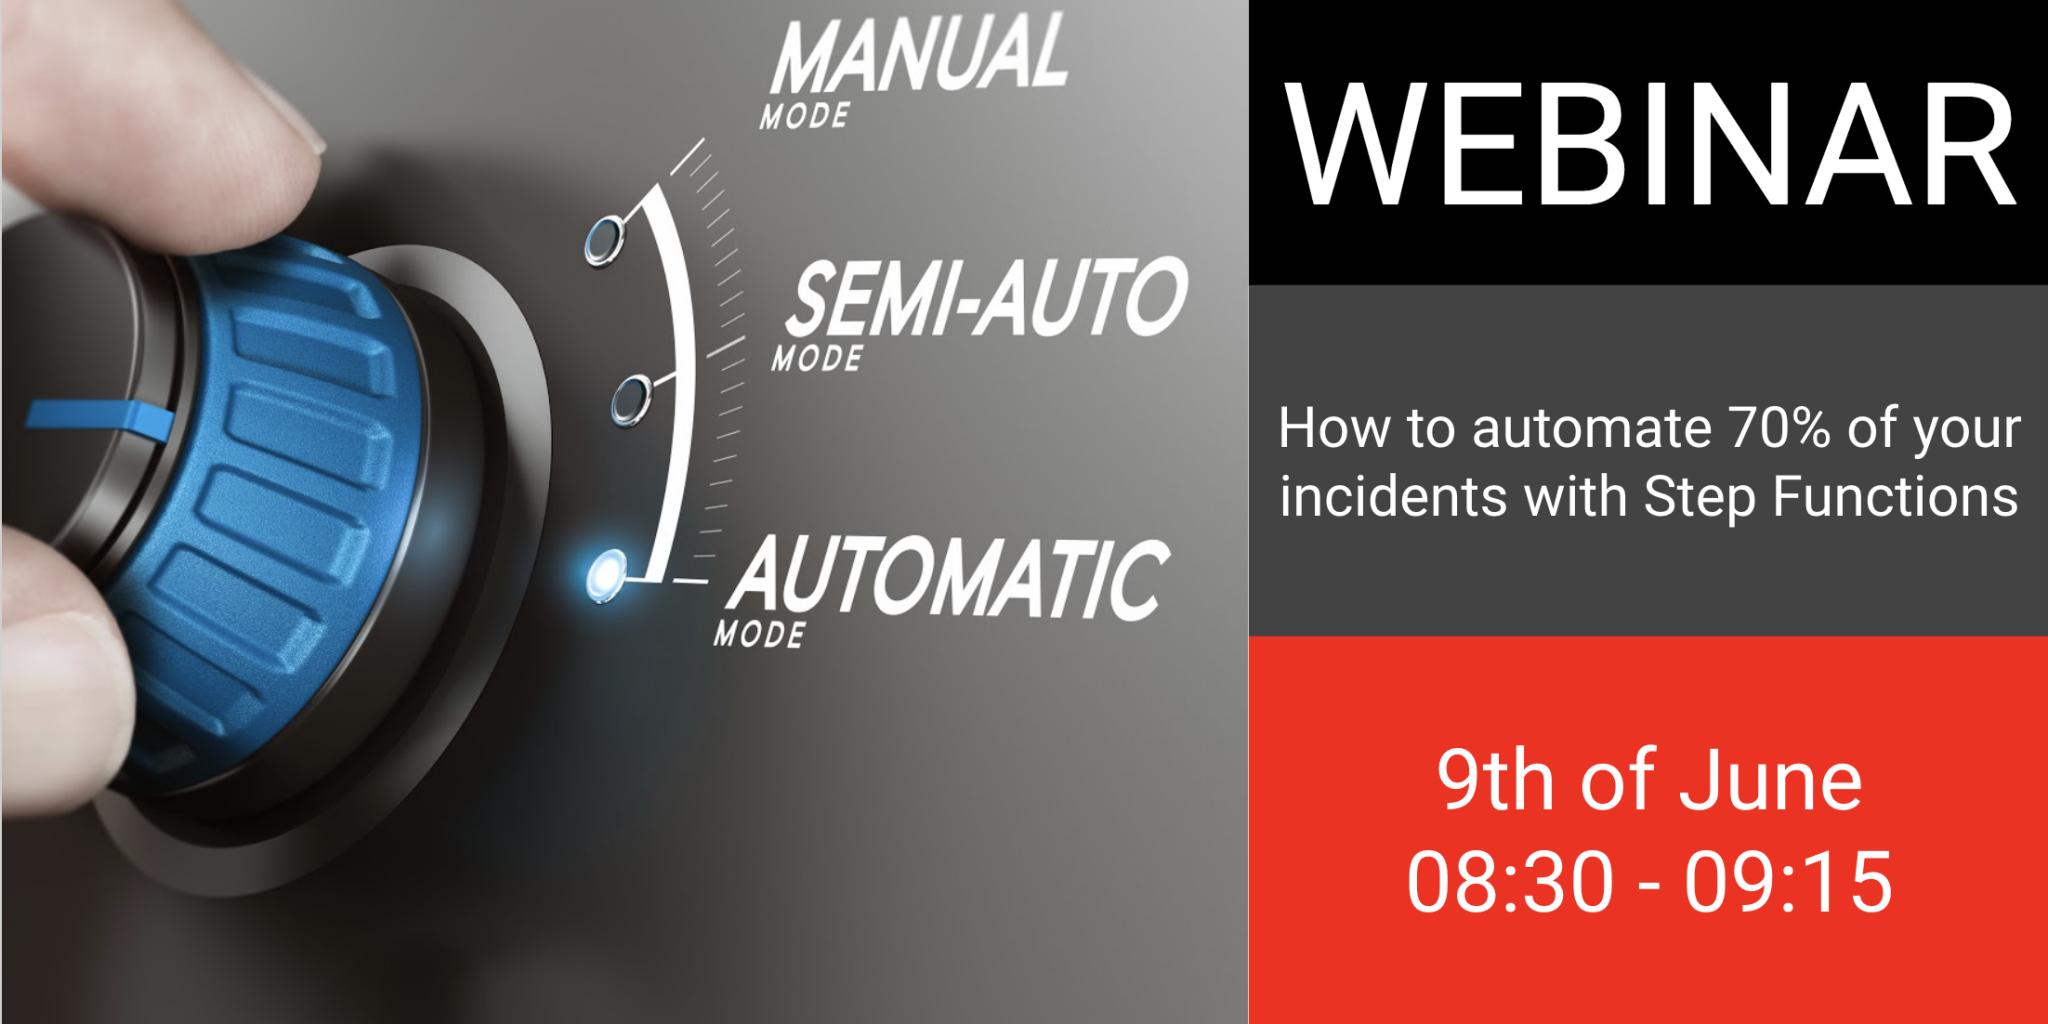 Incident automation webinar